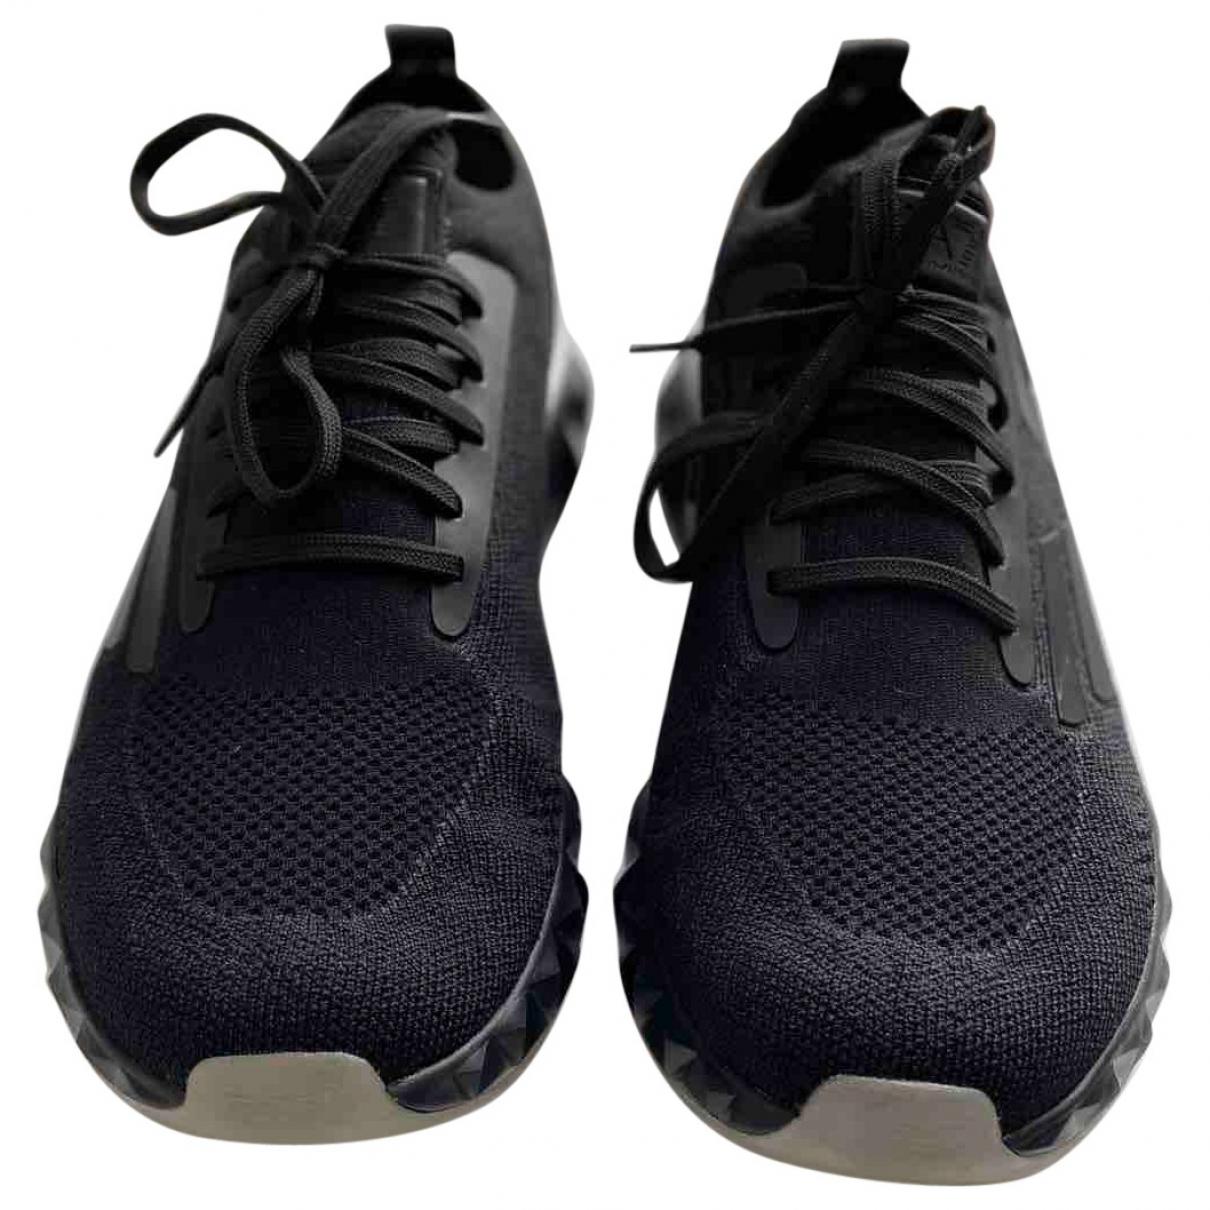 Emporio Armani \N Sneakers in  Schwarz Leinen